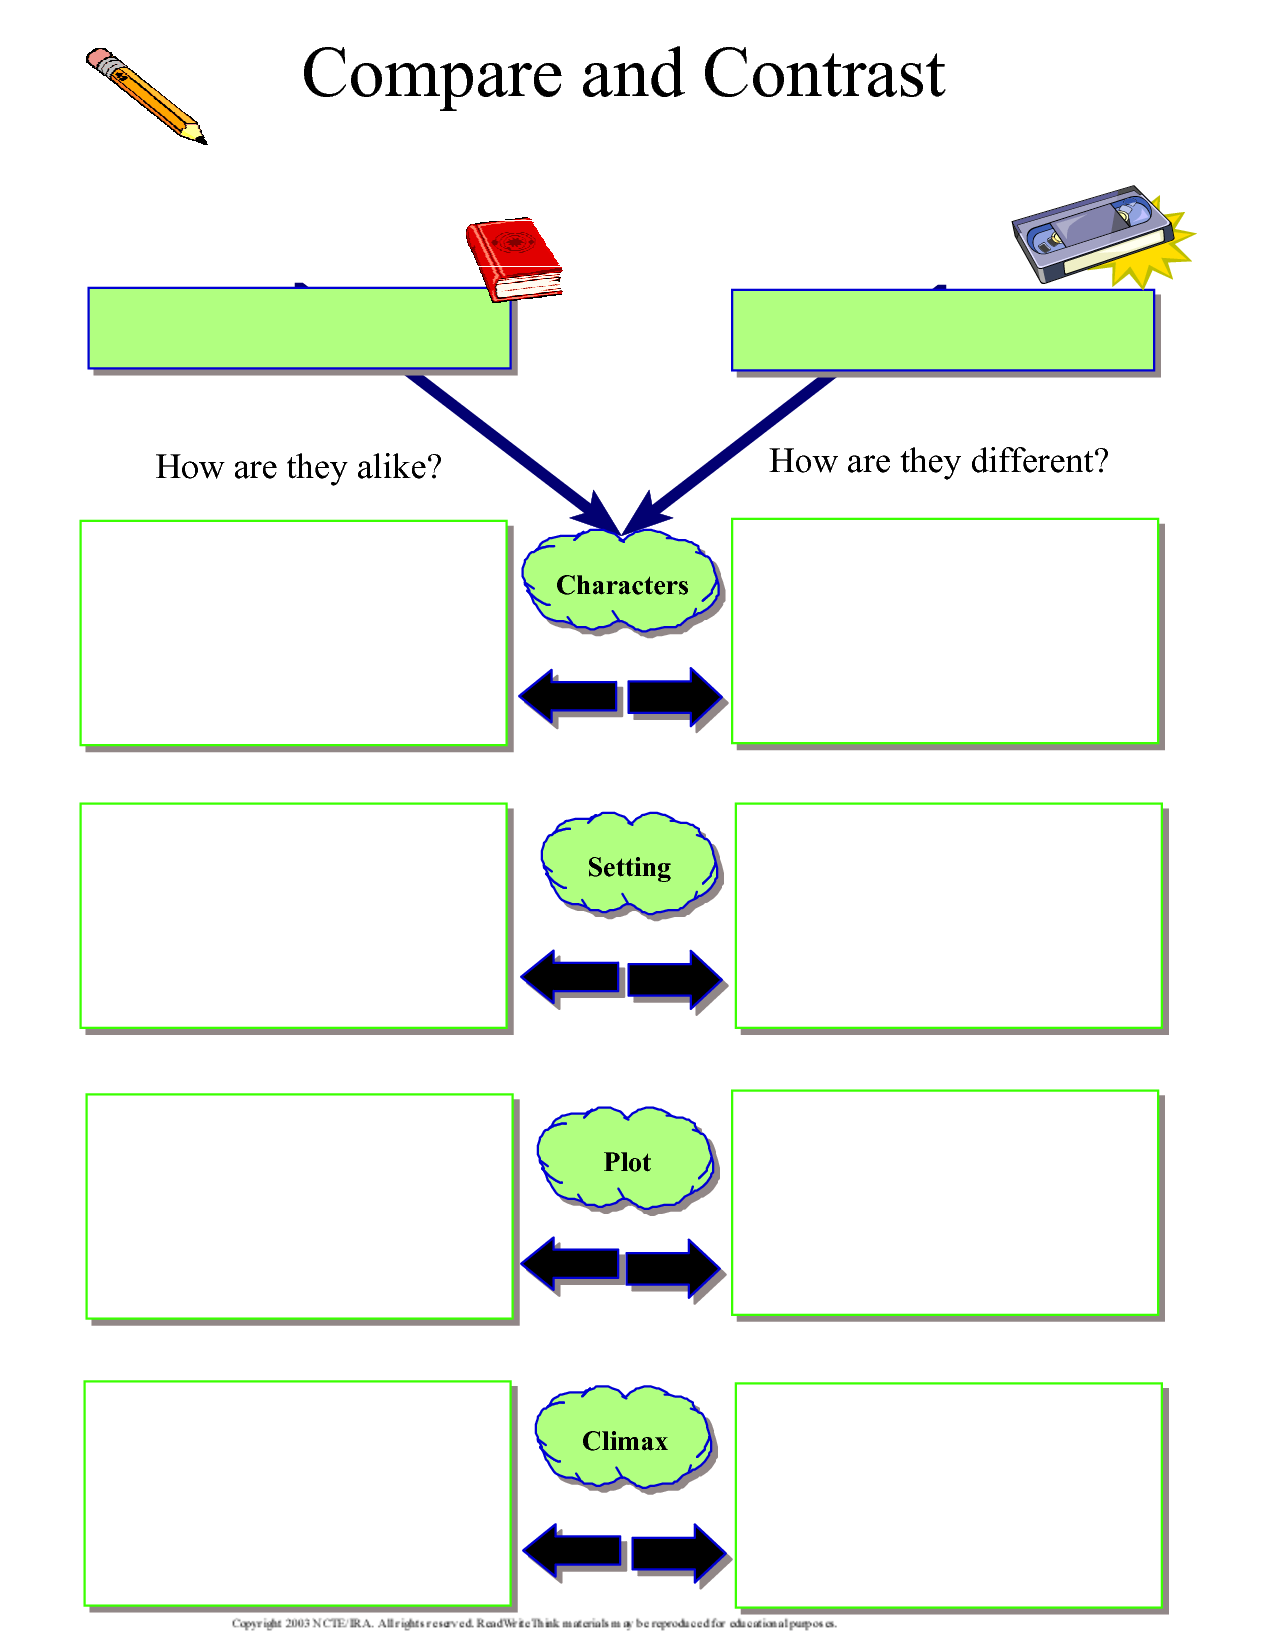 compare and contrast worksheet   Kindergarten worksheets [ 1650 x 1275 Pixel ]